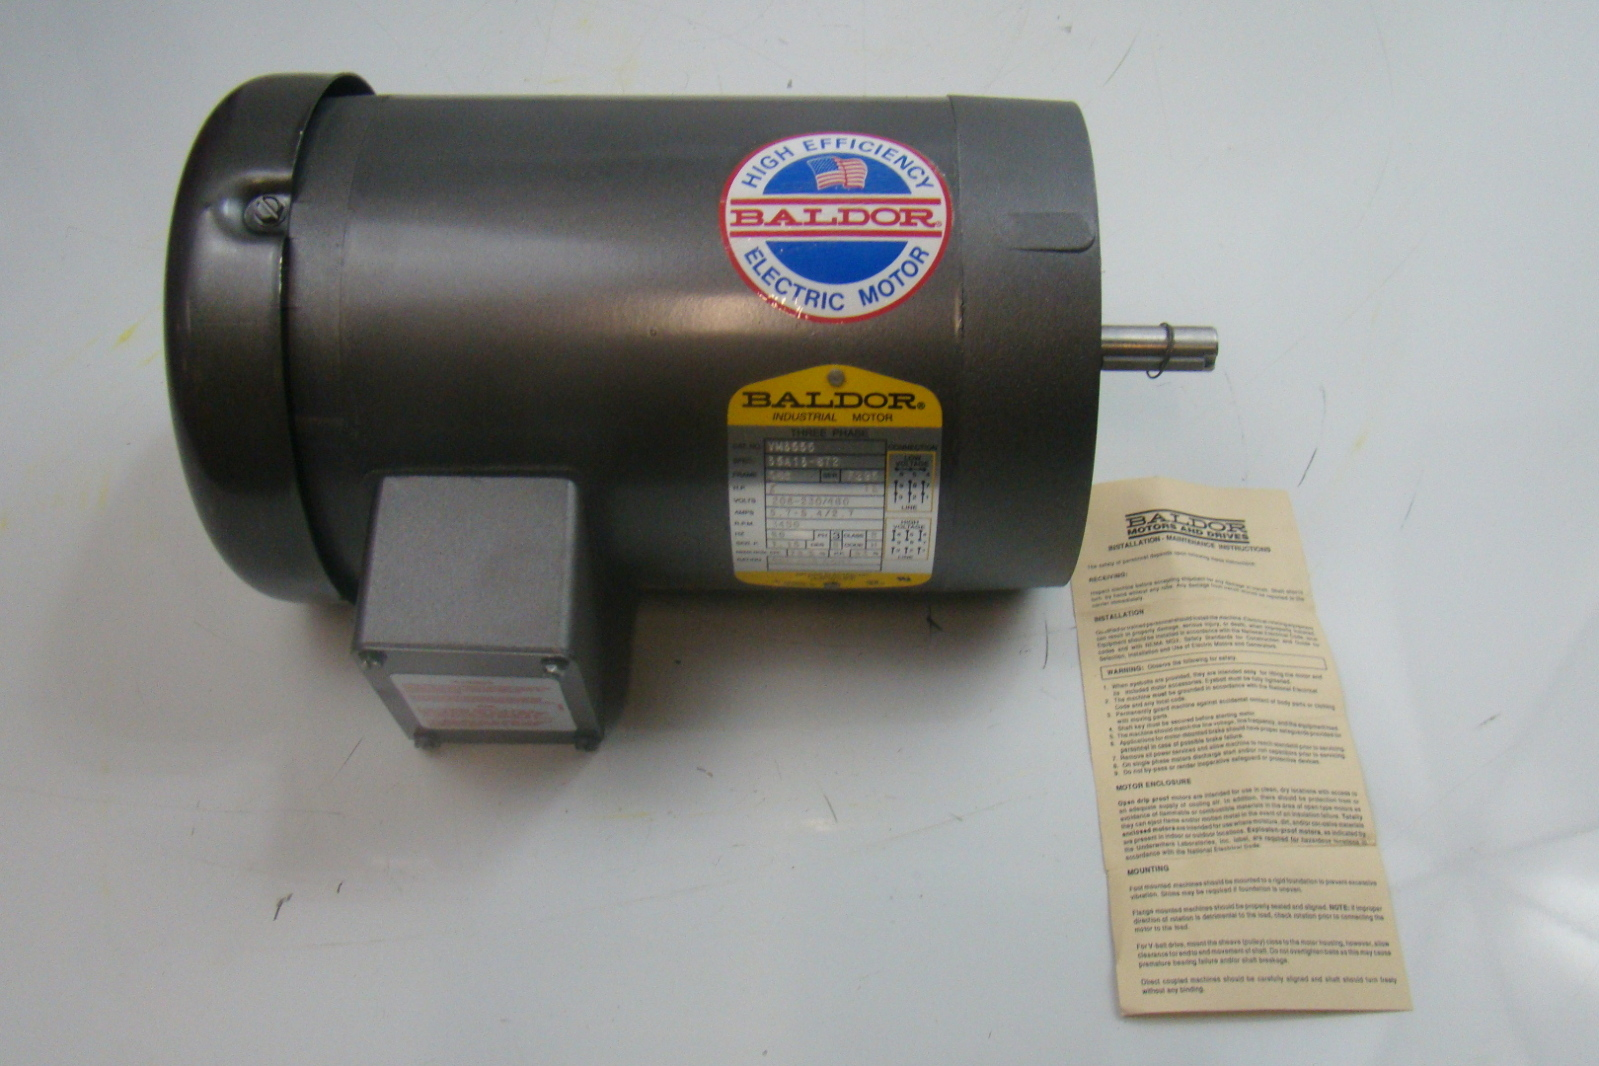 Baldor 2 hp 3450 rpm electric motor vm3555 ebay for 9 hp electric motor